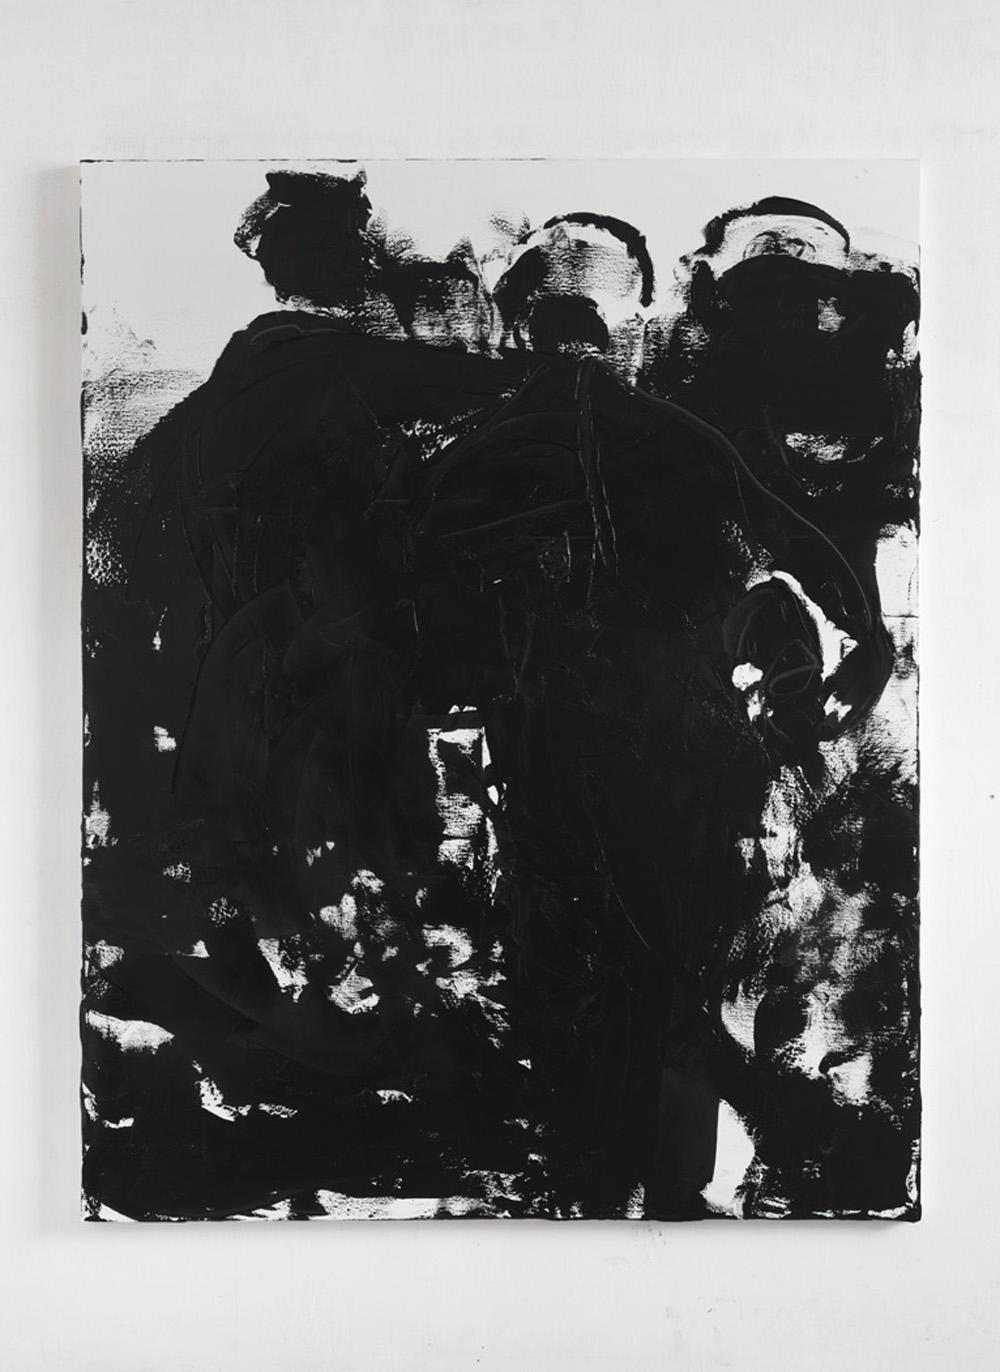 Conversation piece XII, 2017, olio su tela, cm 230x180